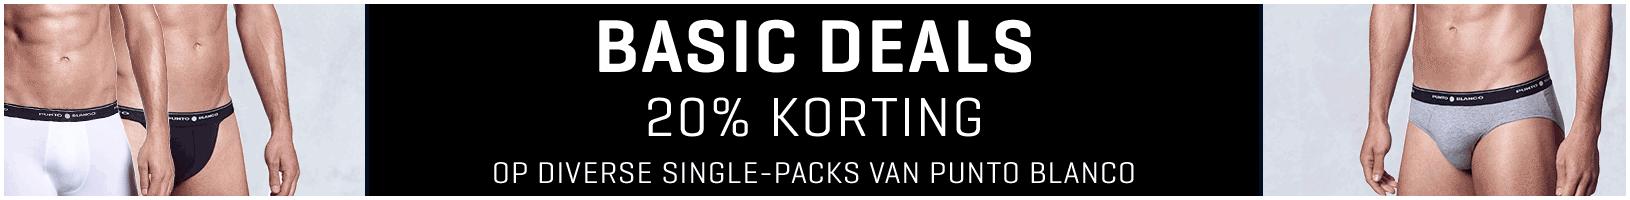 Basic Deals Punto-blanco